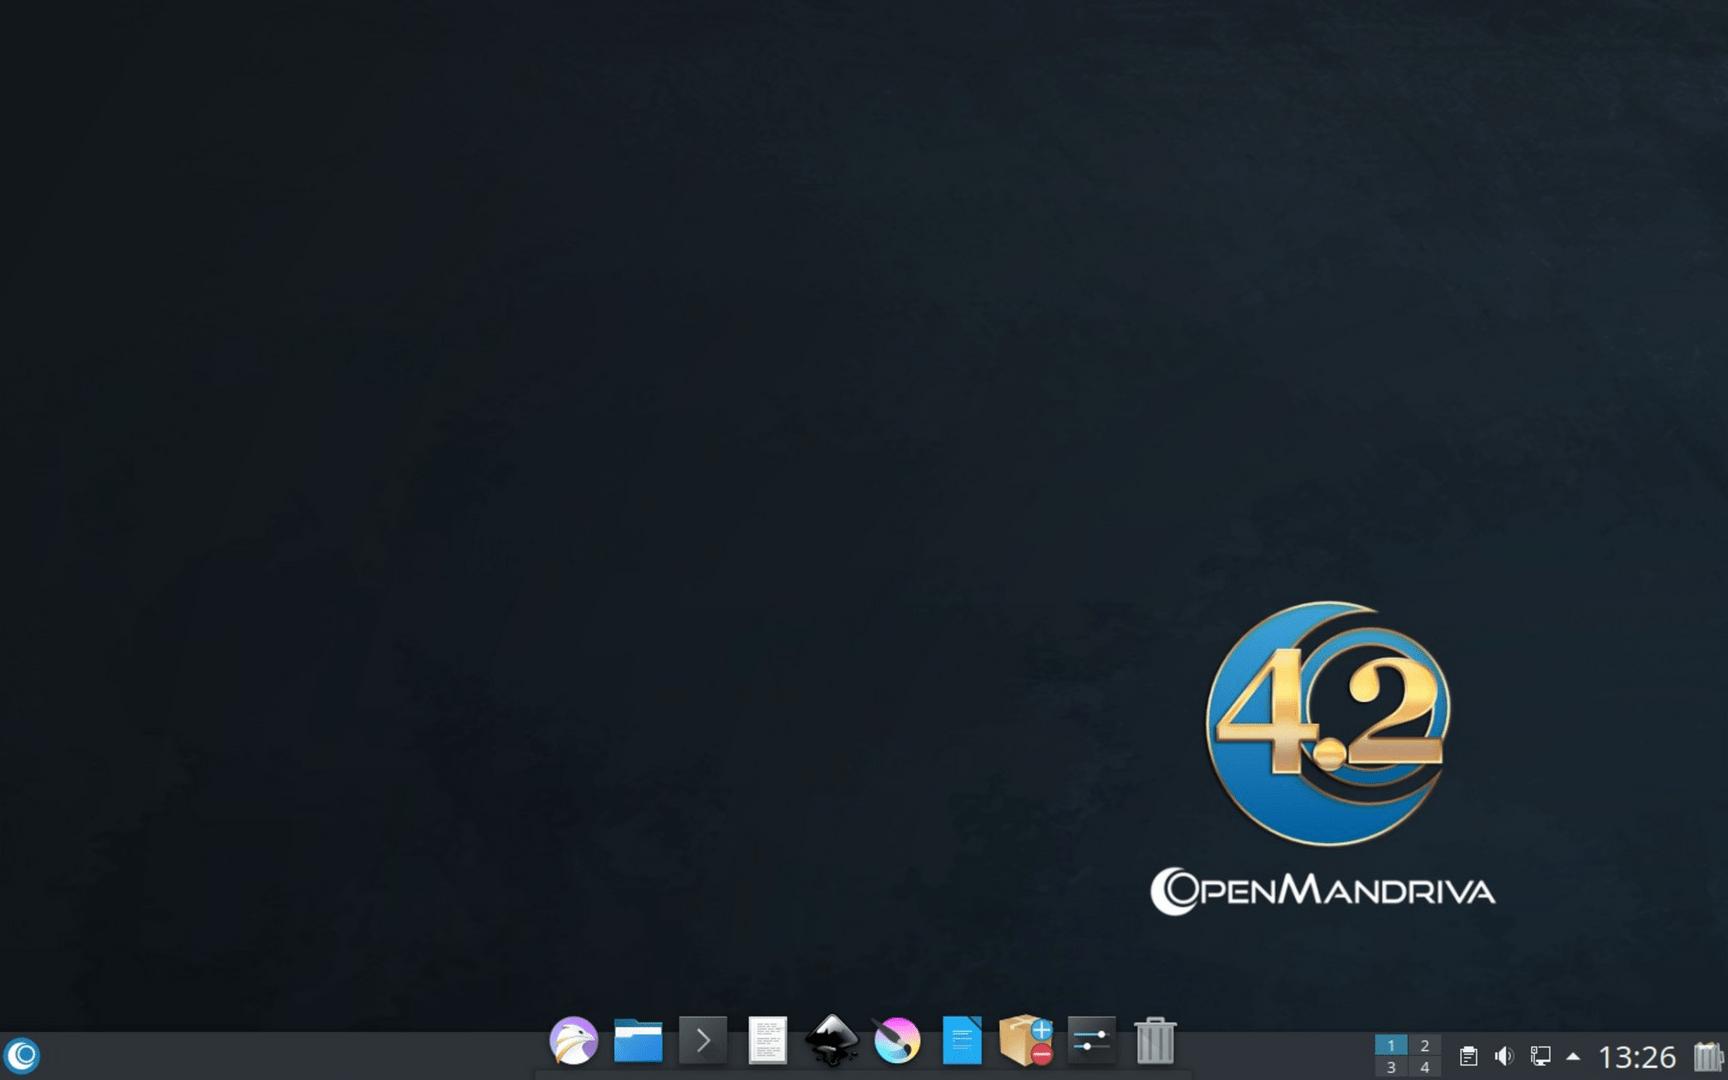 OpenMandriva Lx 4.2 mit Linux 5.10.14 und KDE Plasma 5.20.5